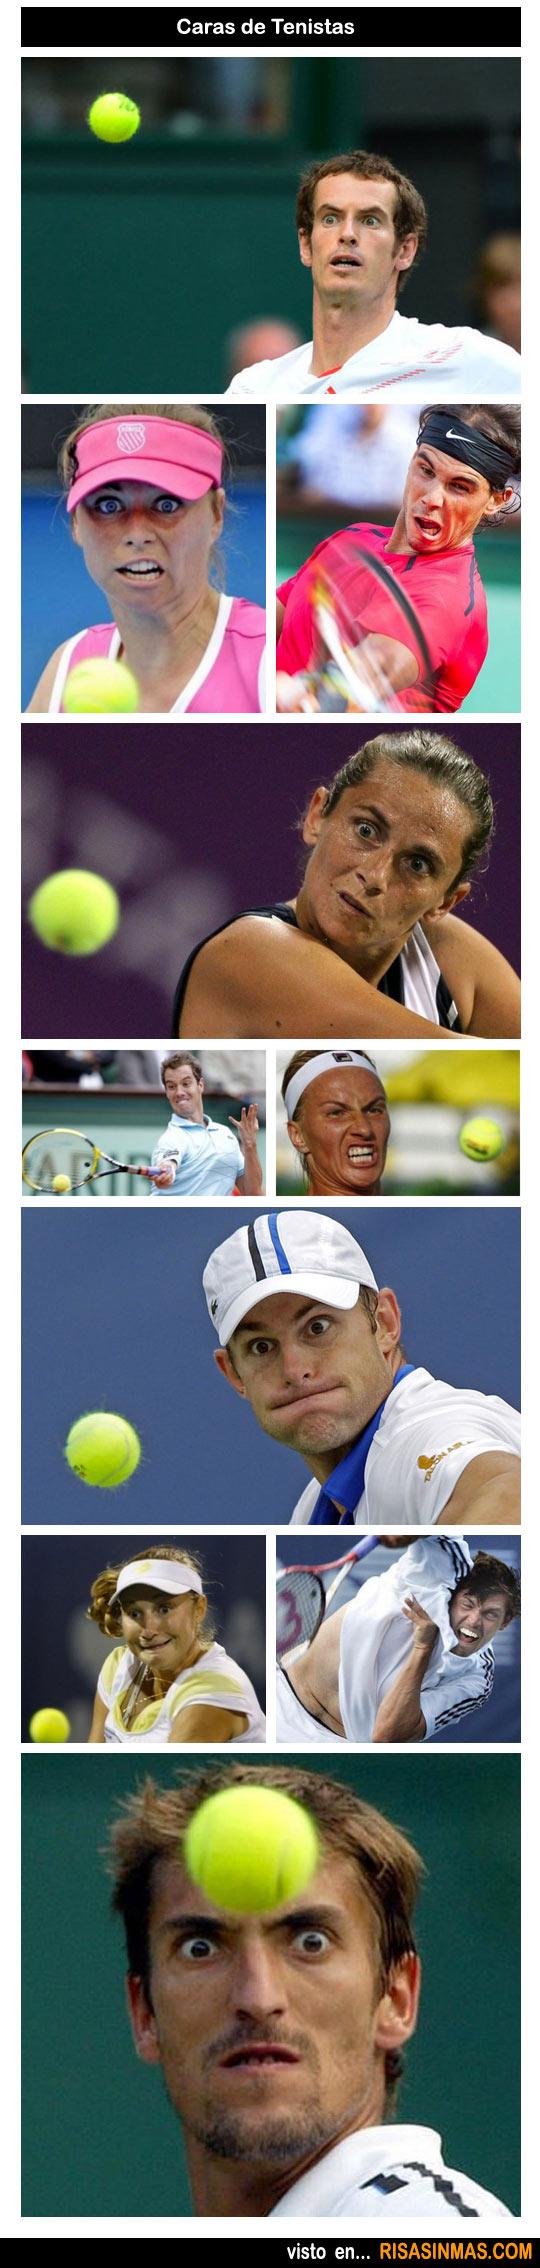 Caras de tenistas